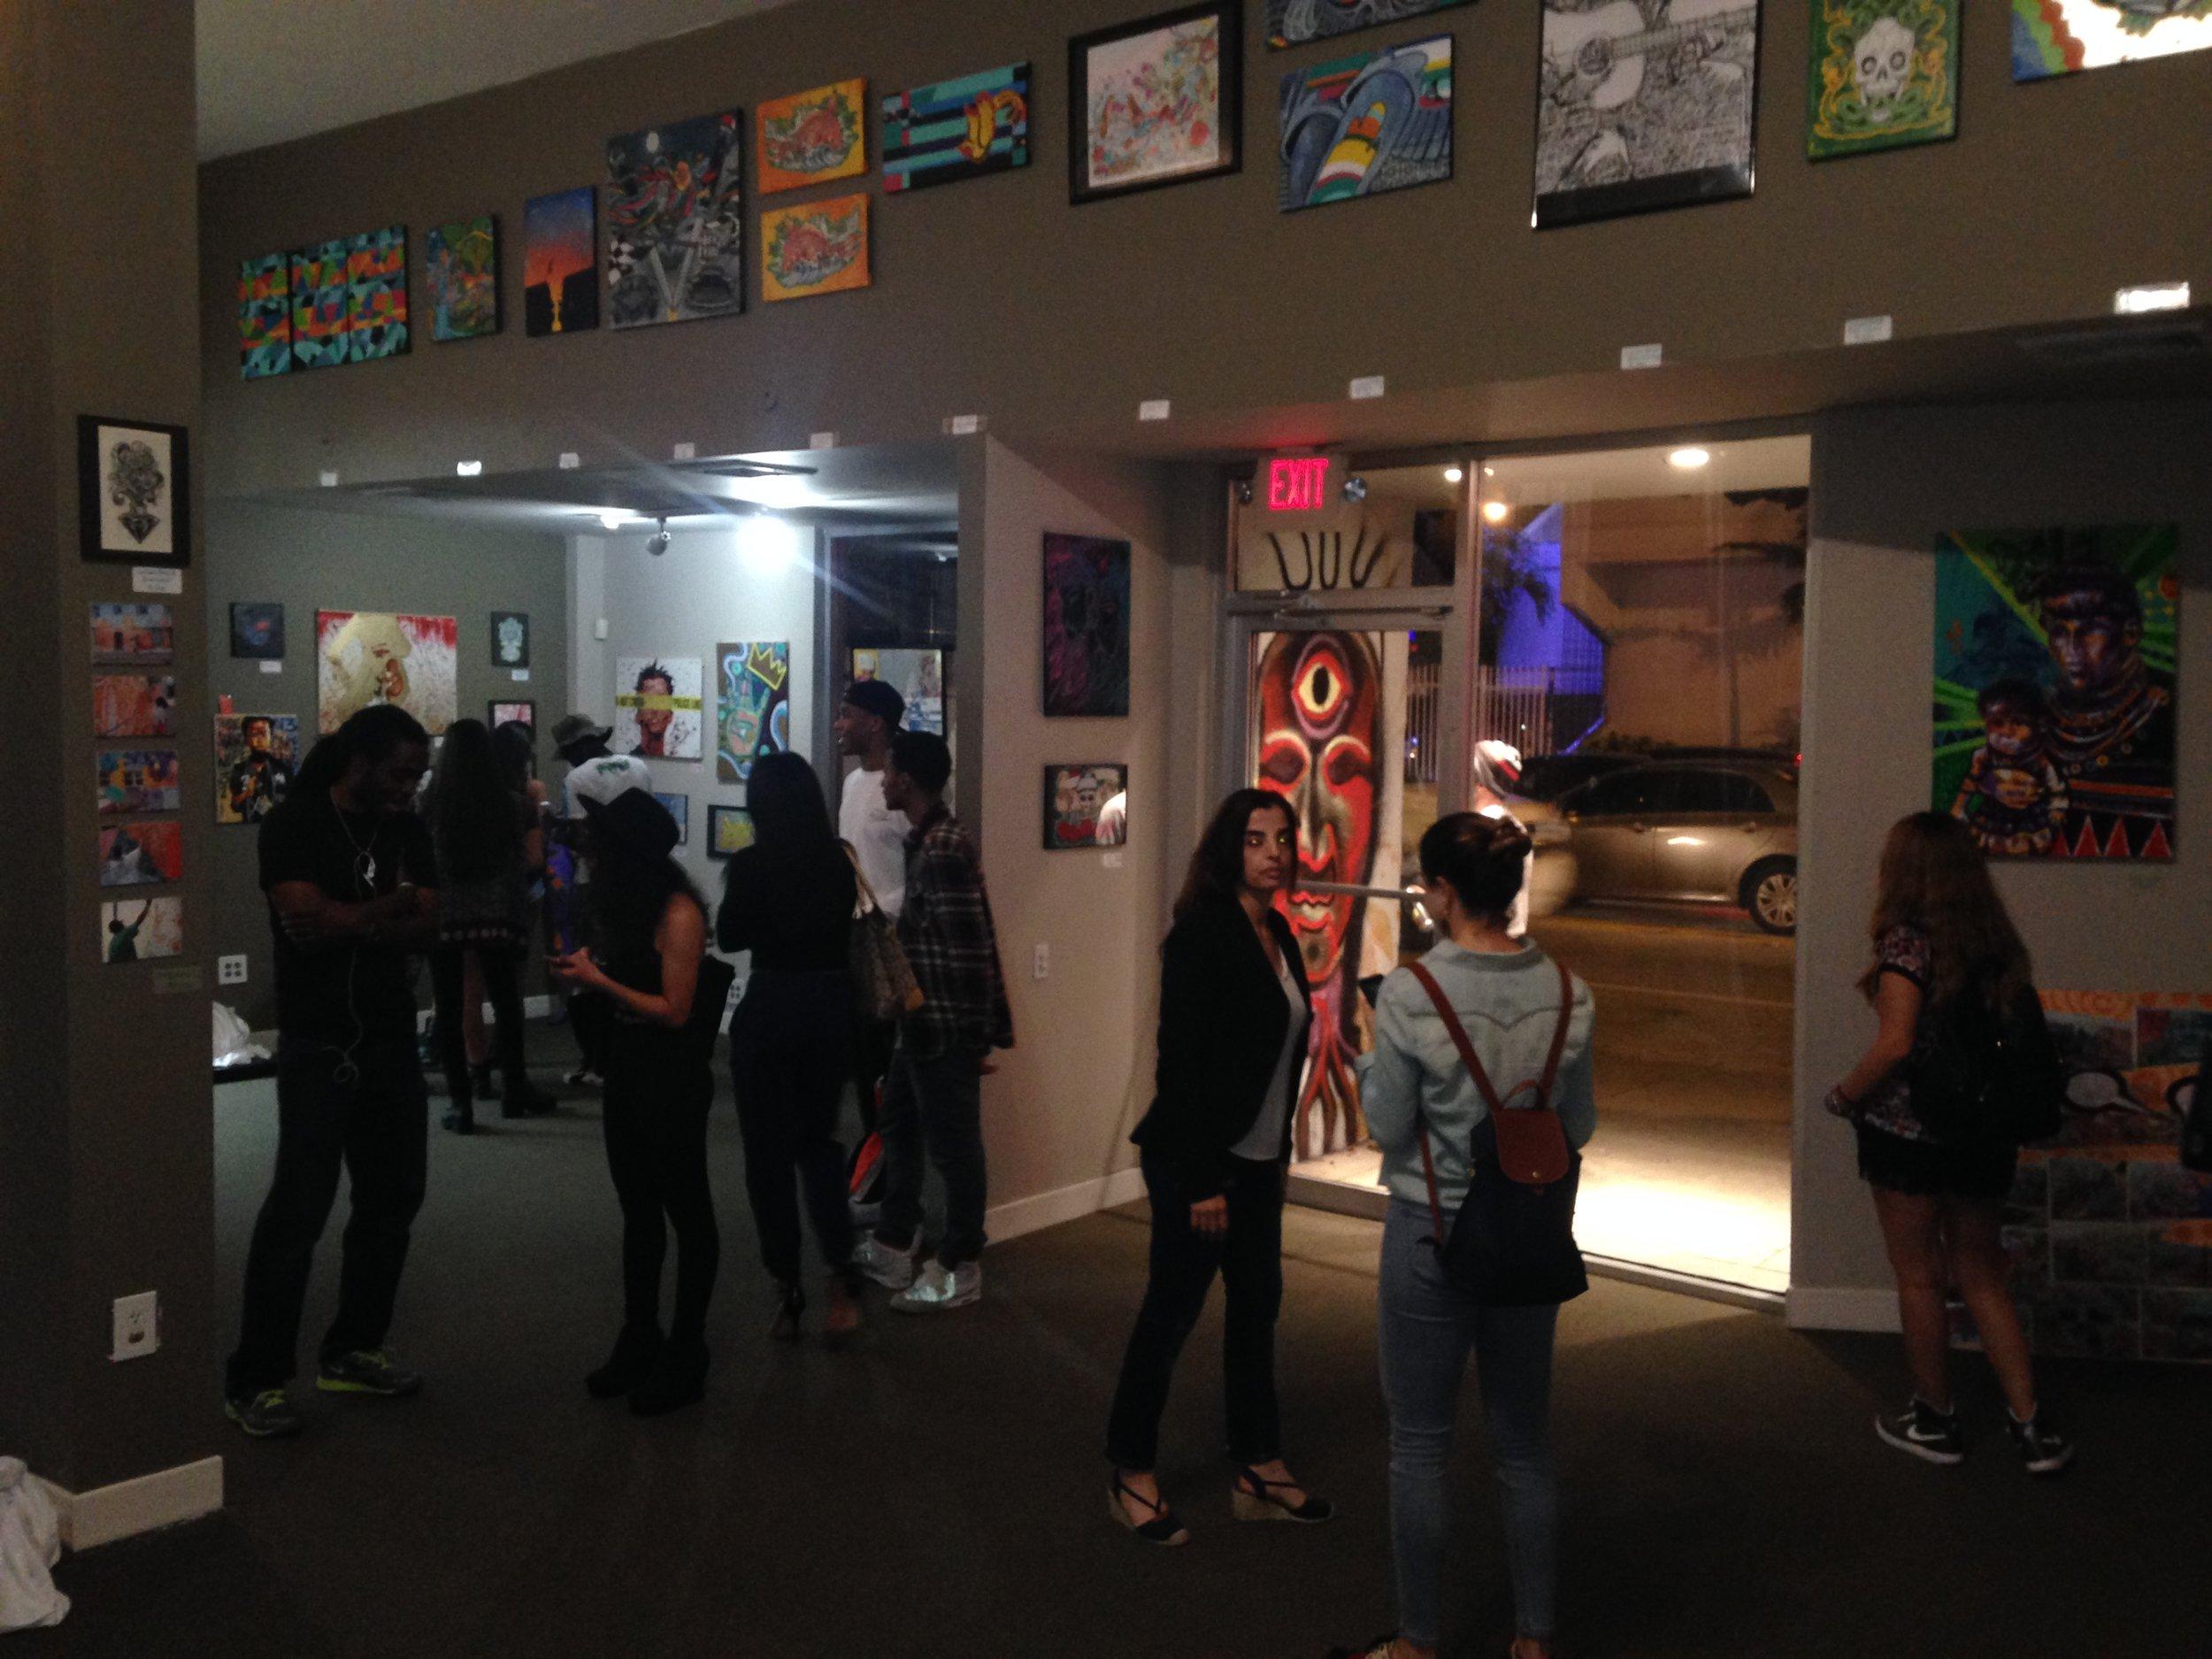 Miami Marine stadium show 2014 art basel.JPG